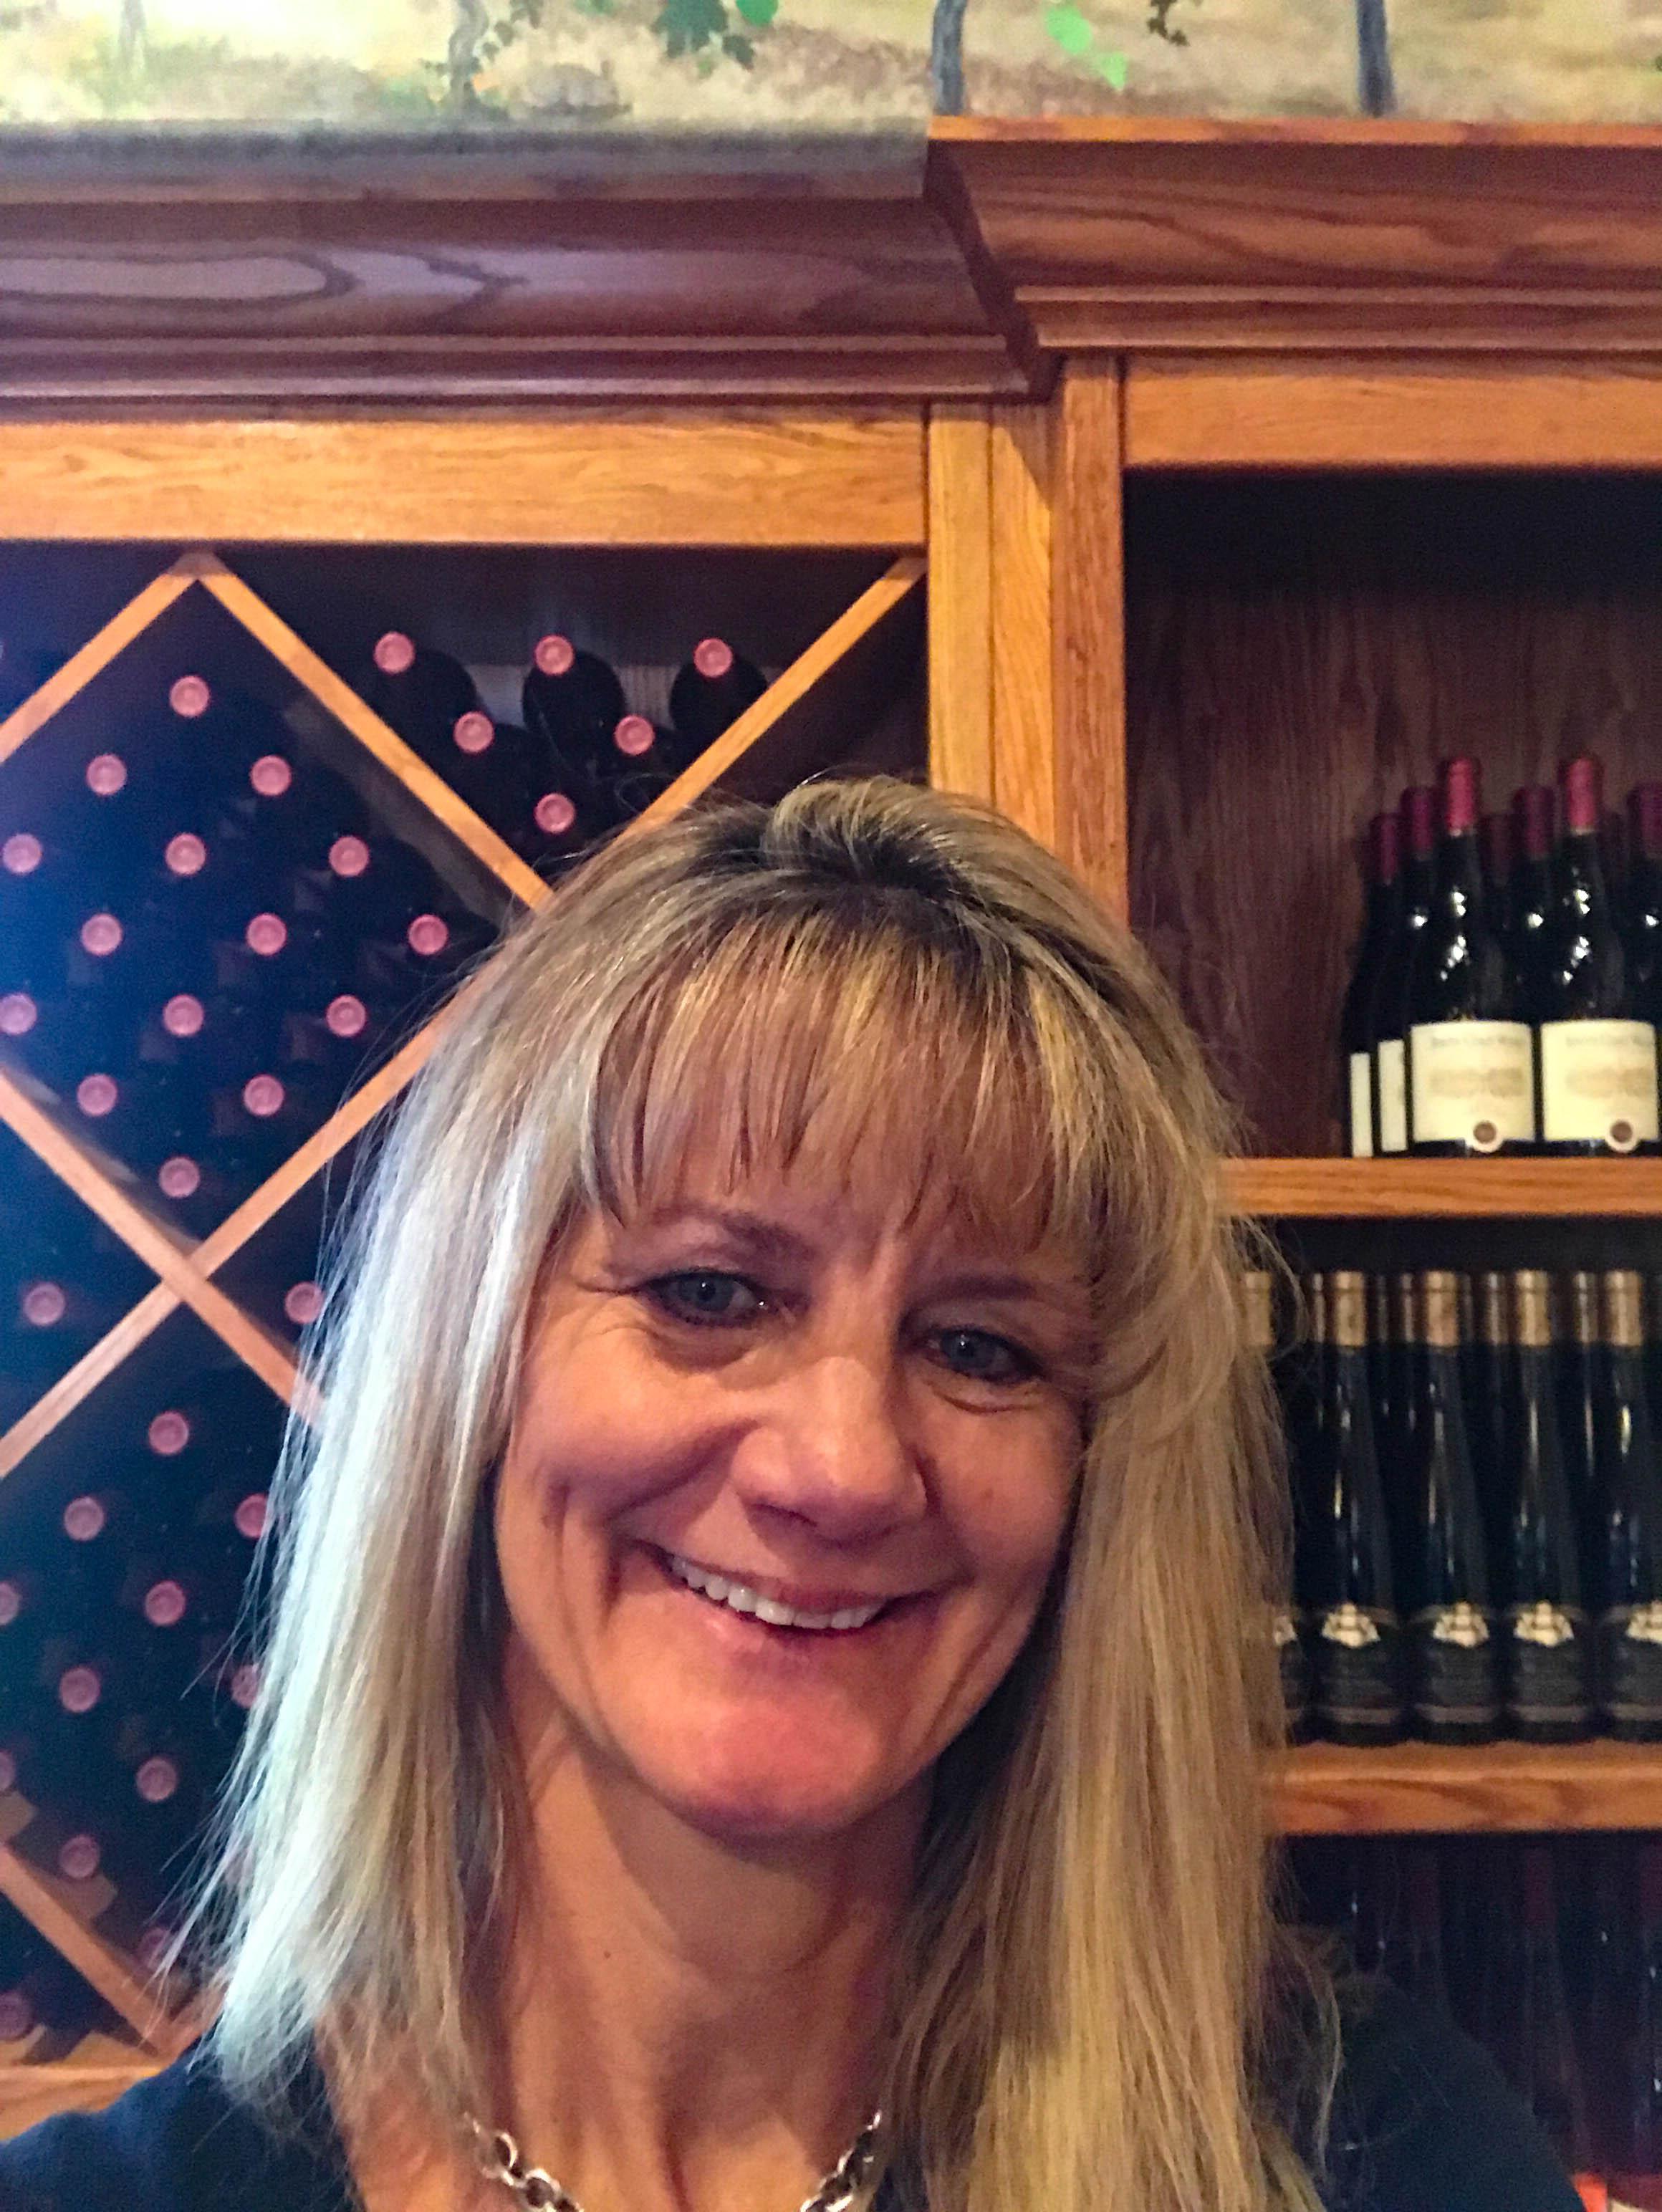 Temecula Wine Tasting Tour - South Coast Winery